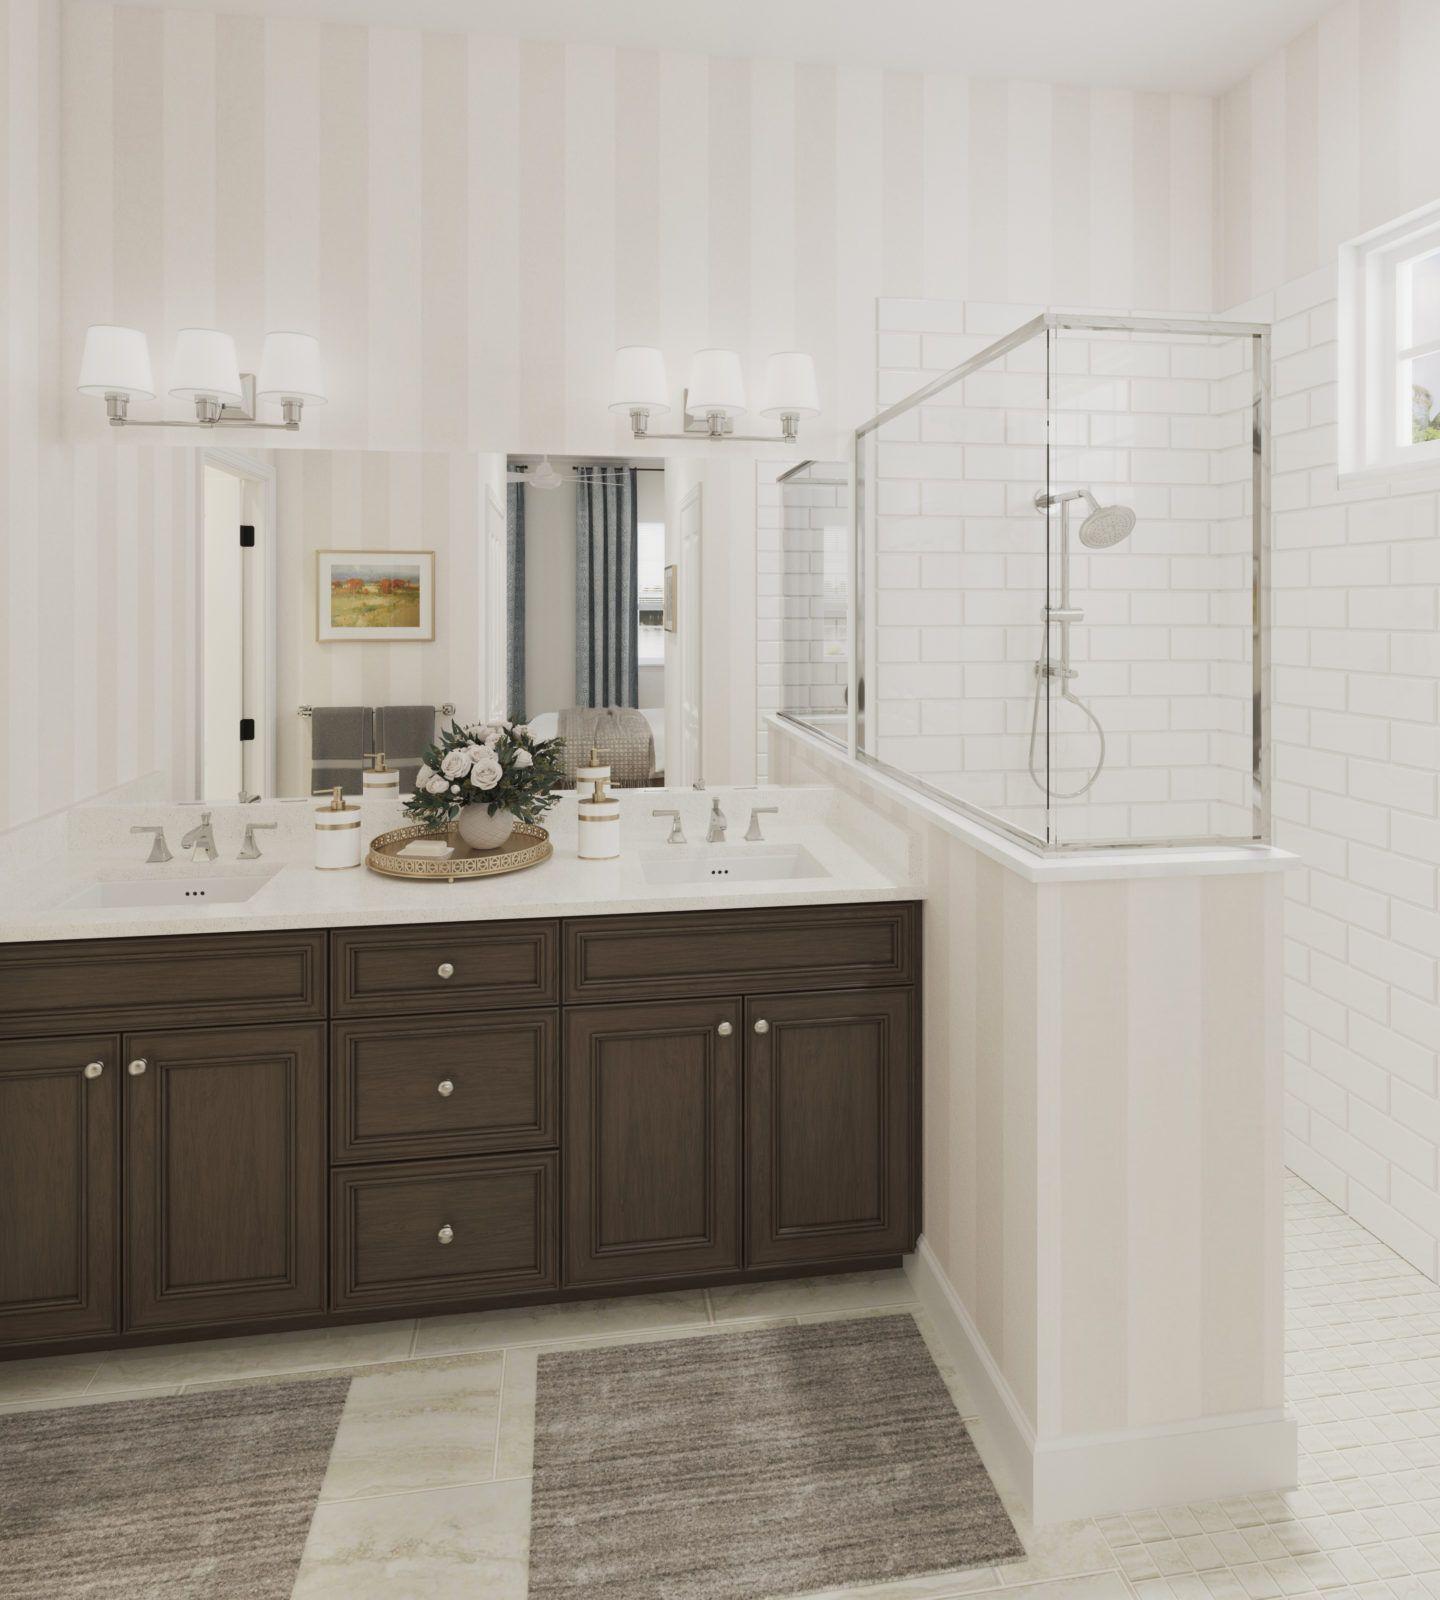 Bathroom featured in the Augusta By Neal Communities in Punta Gorda, FL